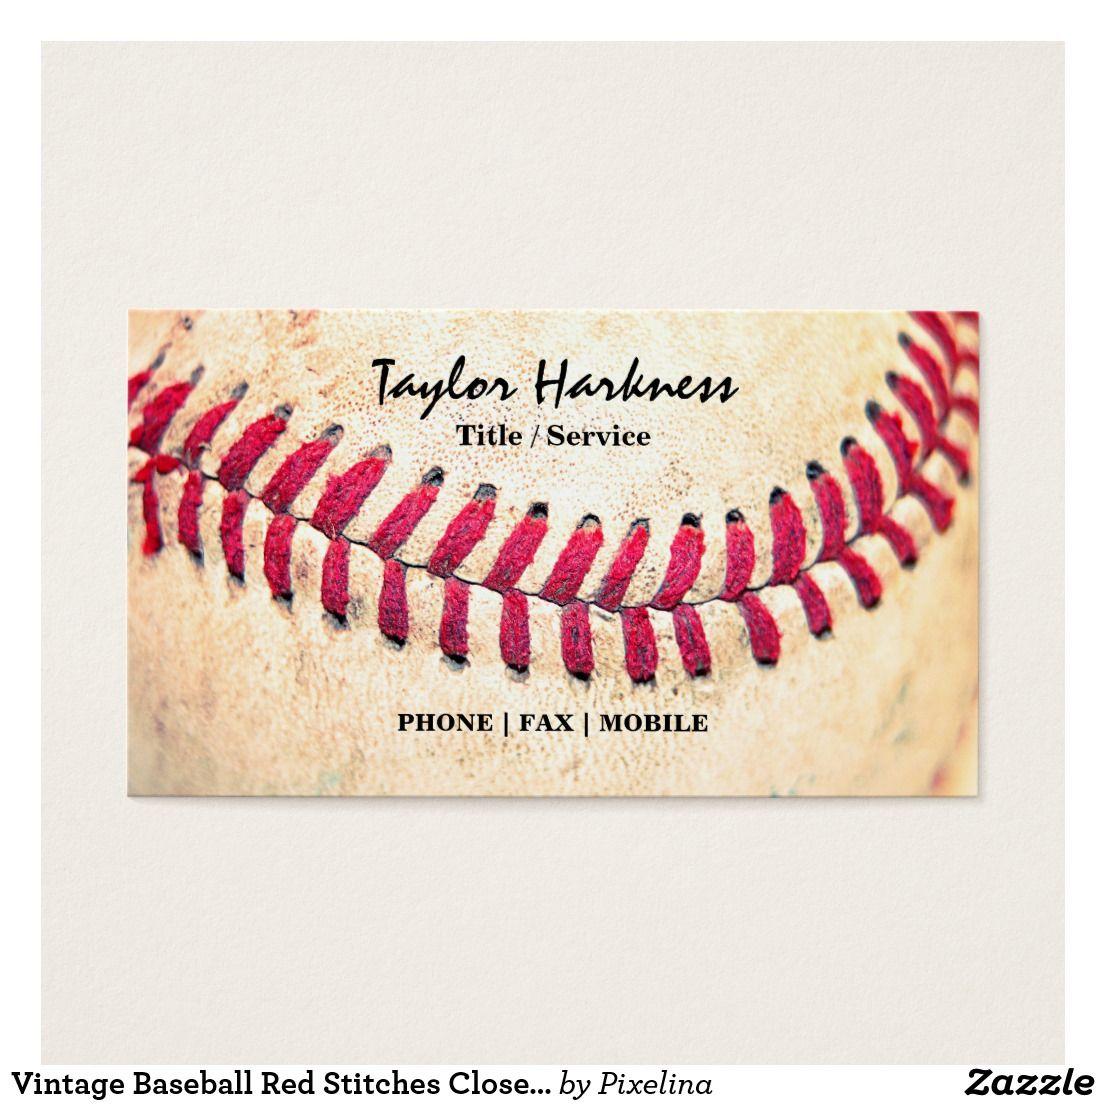 Vintage baseball red stitches close up photo business card vintage baseball red stitches close up photo business card colourmoves